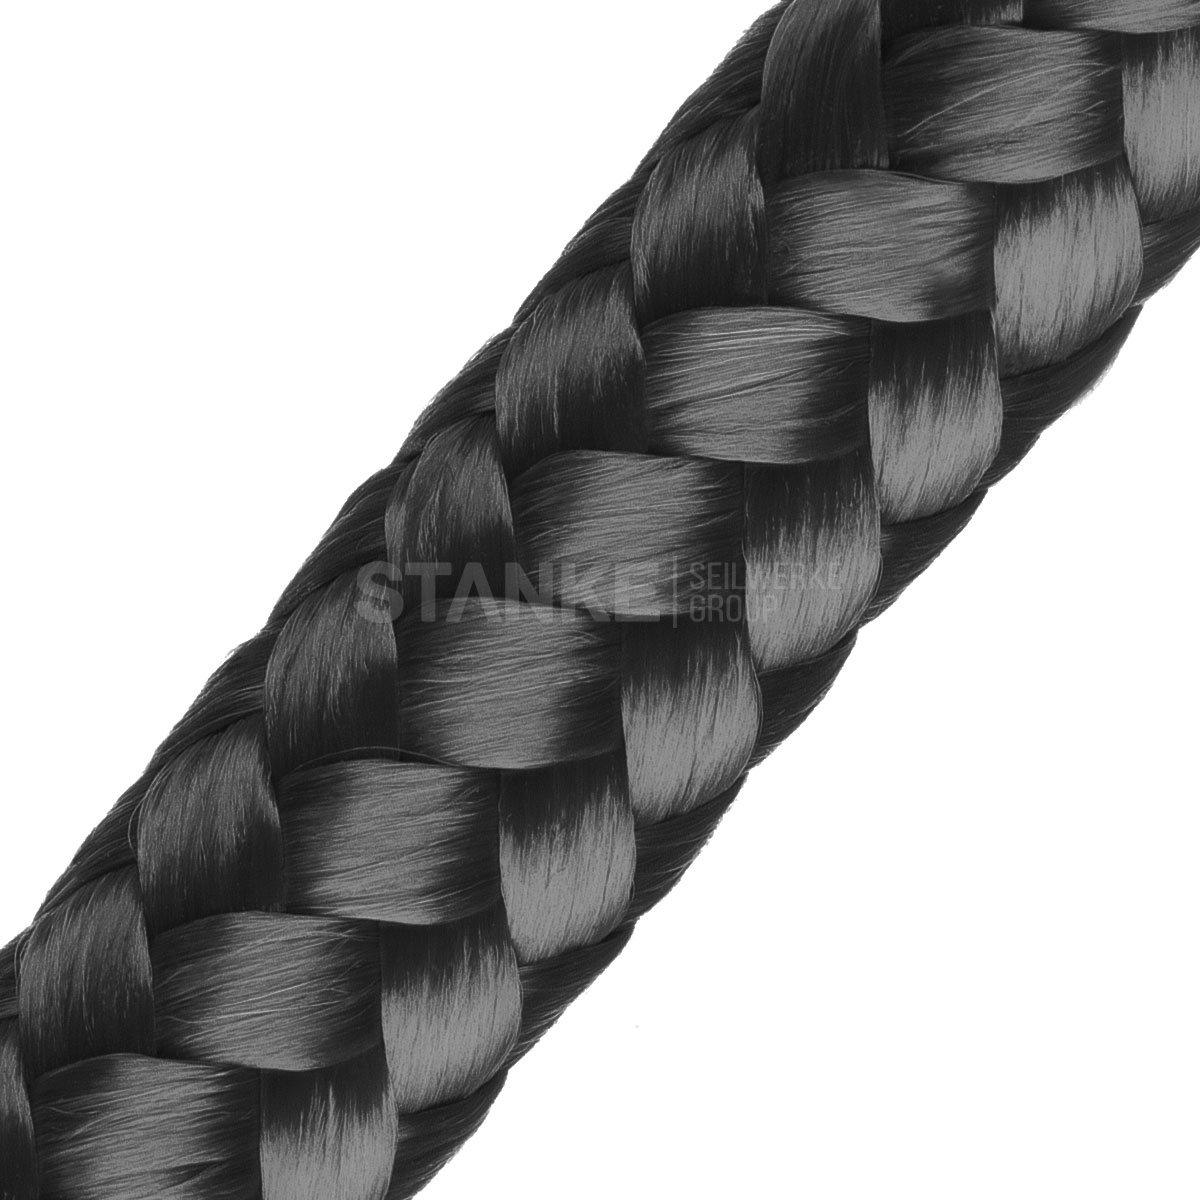 Seilwerk STANKE 15 m 8 mm corde en polypropyl/ène corde damarrage gr/éement corde noir